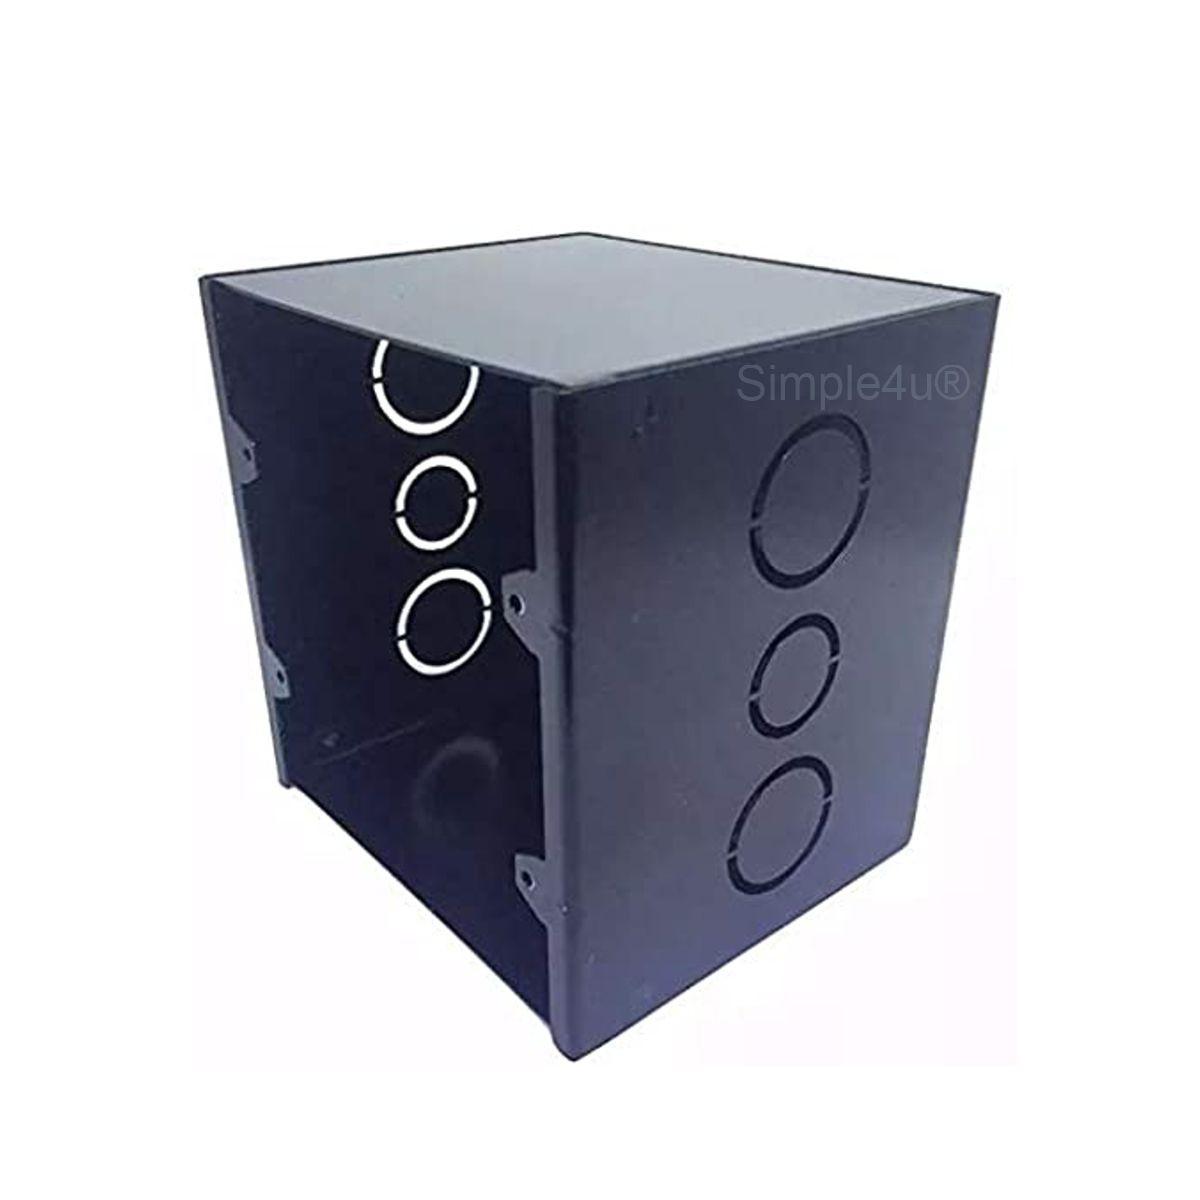 Kit Amplificador de Parede Bluetooth LAC NG + 2 Caixas Acústicas de Embutir SQ6-60 BL Loud